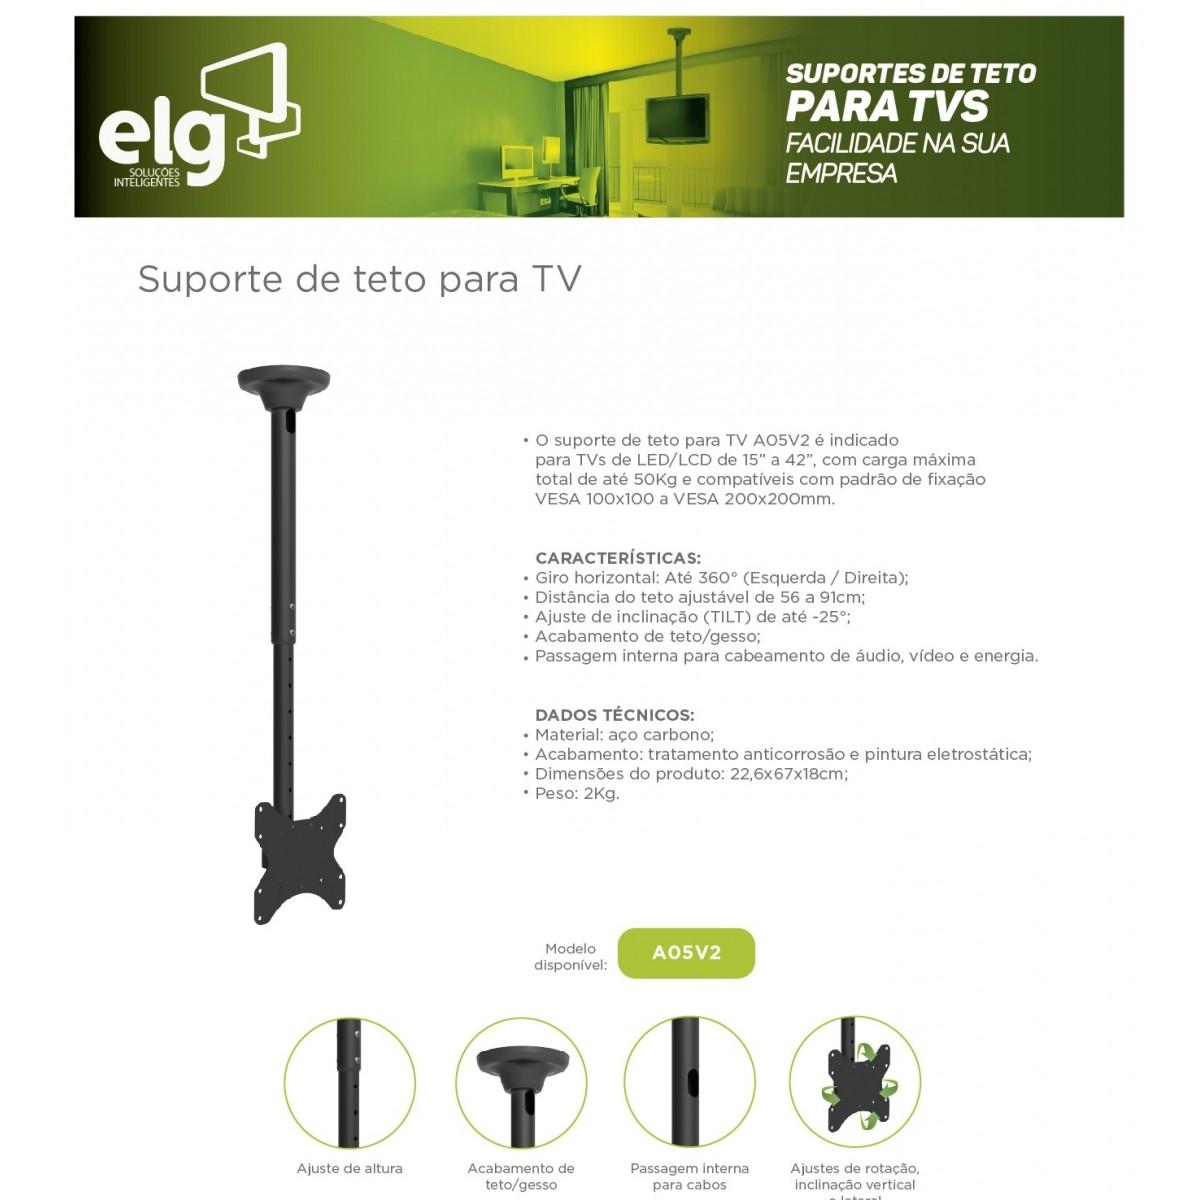 Suporte de Teto para TV / Monitor Lcd Led 15 A 32 A05v2 ELG  - Central Suportes